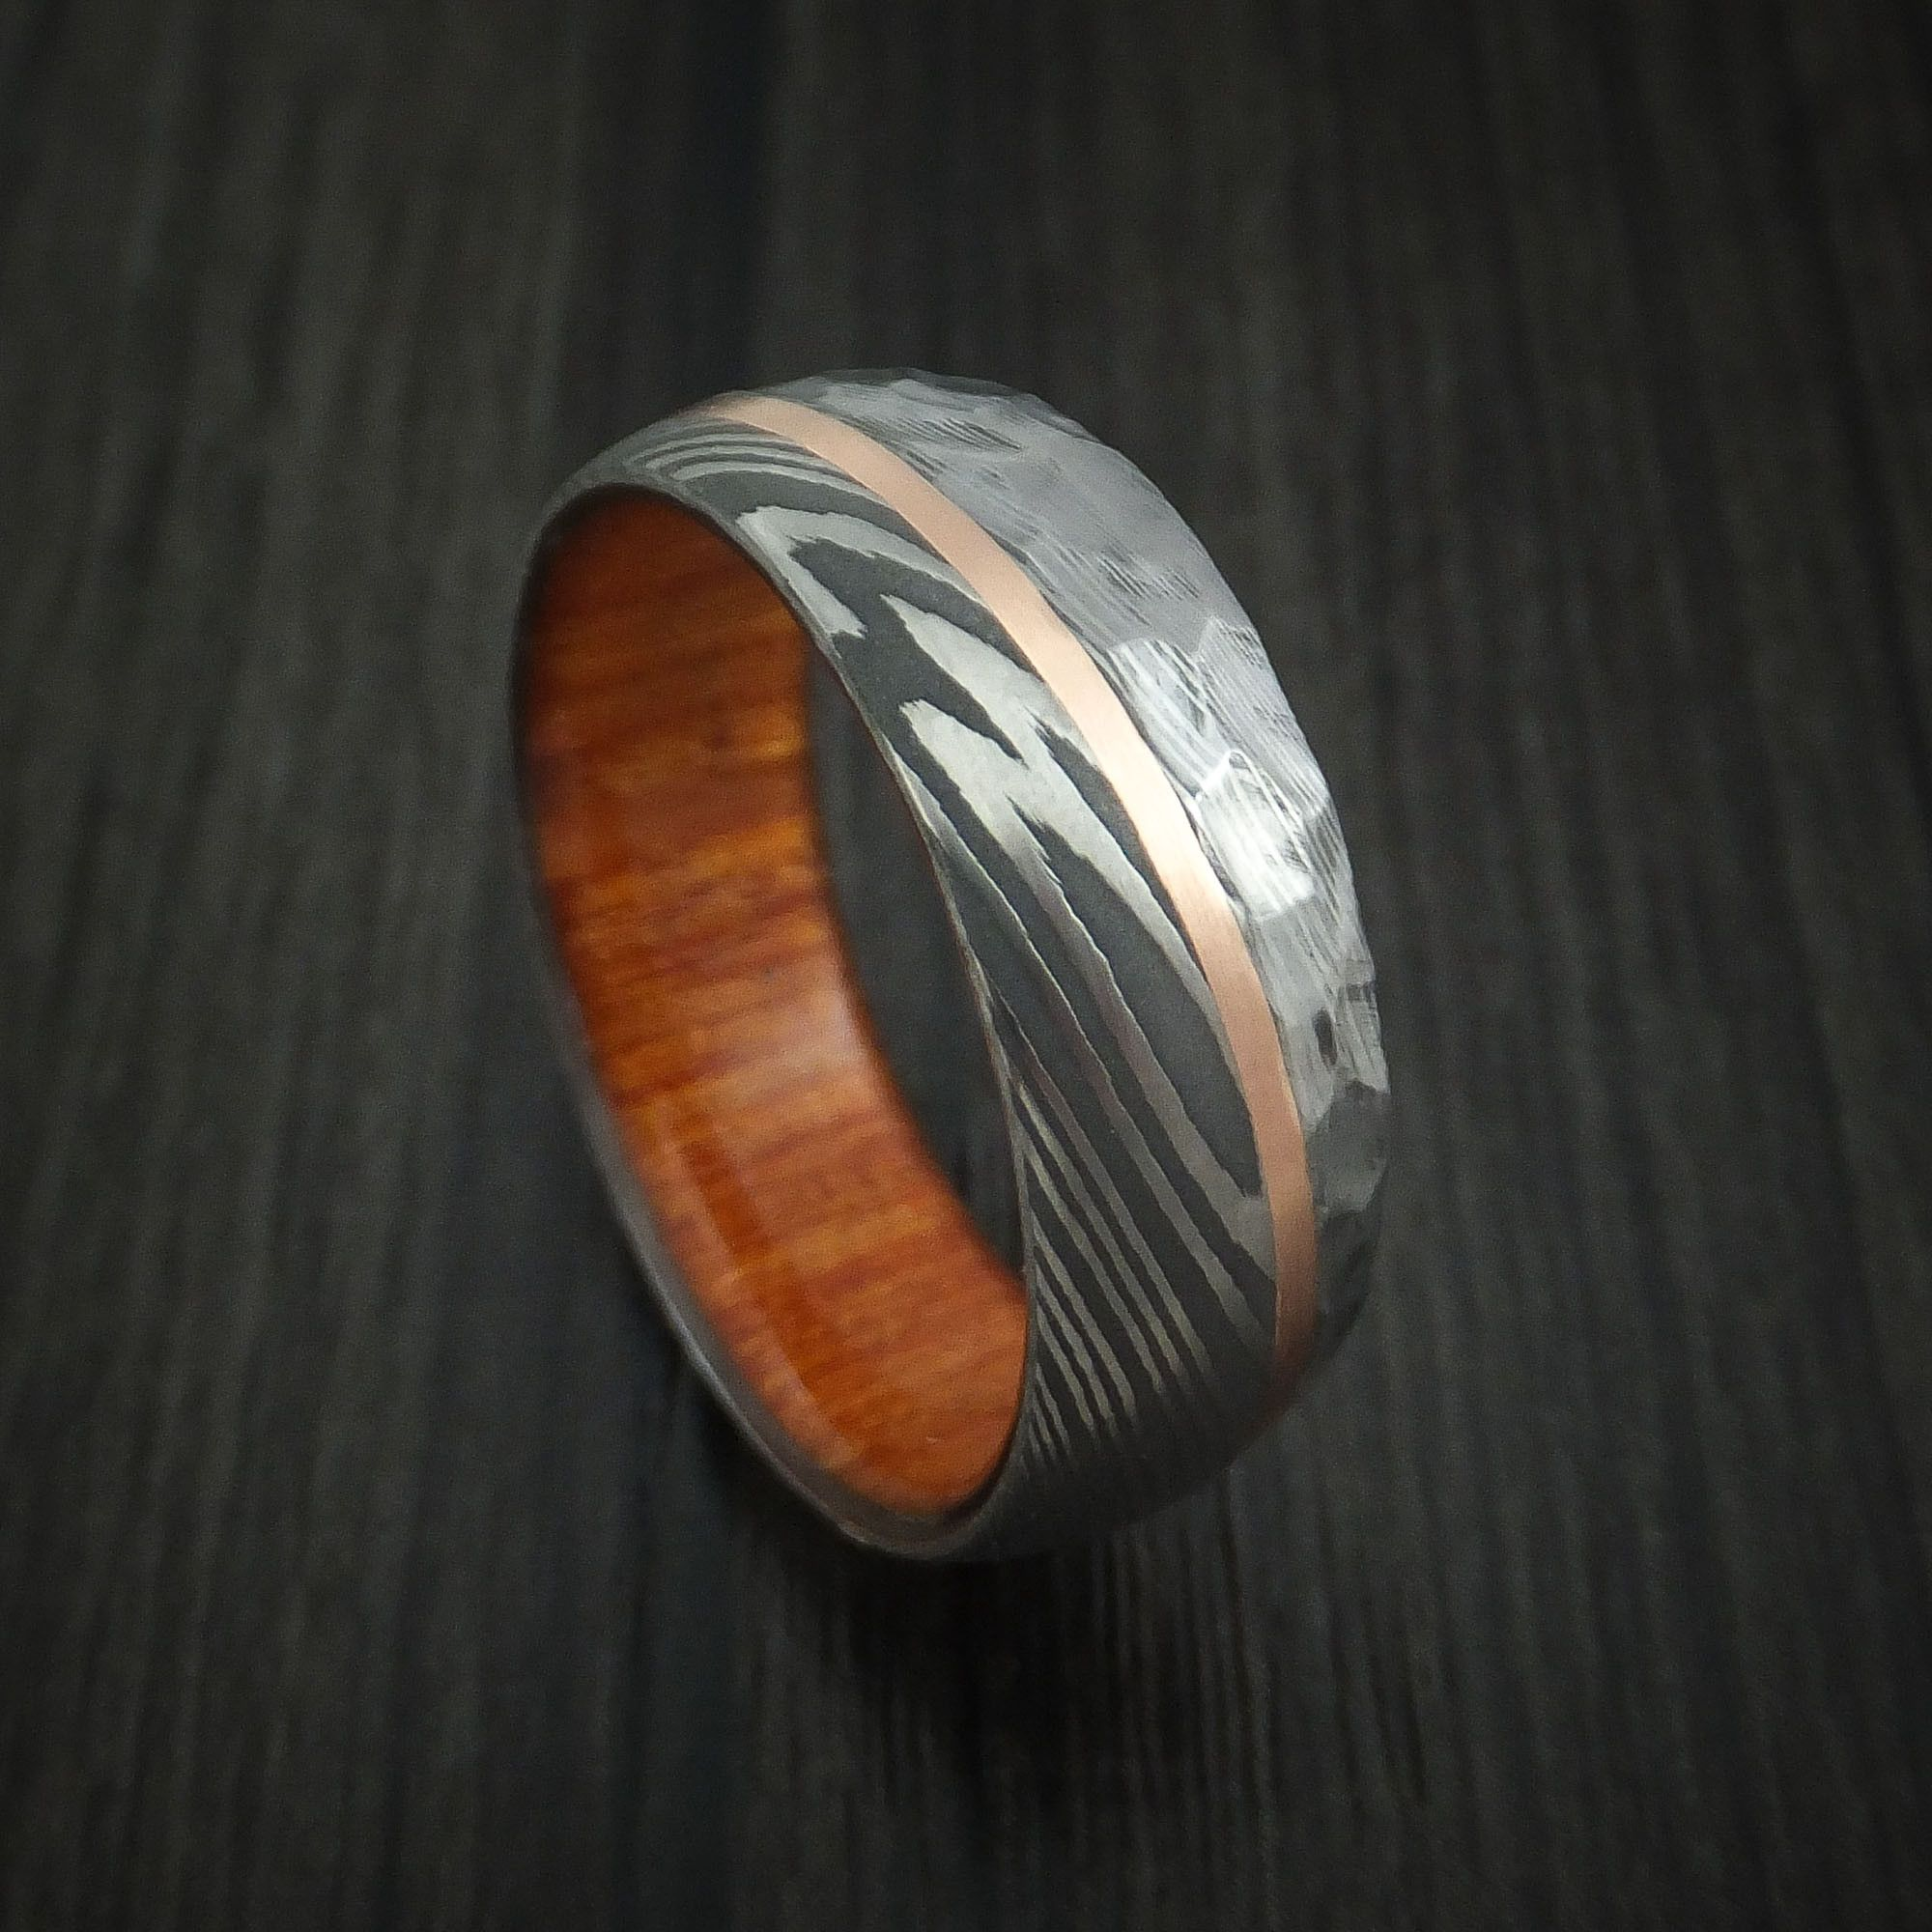 Damascus Wood Ring Wood Wedding Band Wooden Wedding Band Wooden Ring Damascus Steel Ring Damascus Steel Wedding Band Bocote Wood Ring